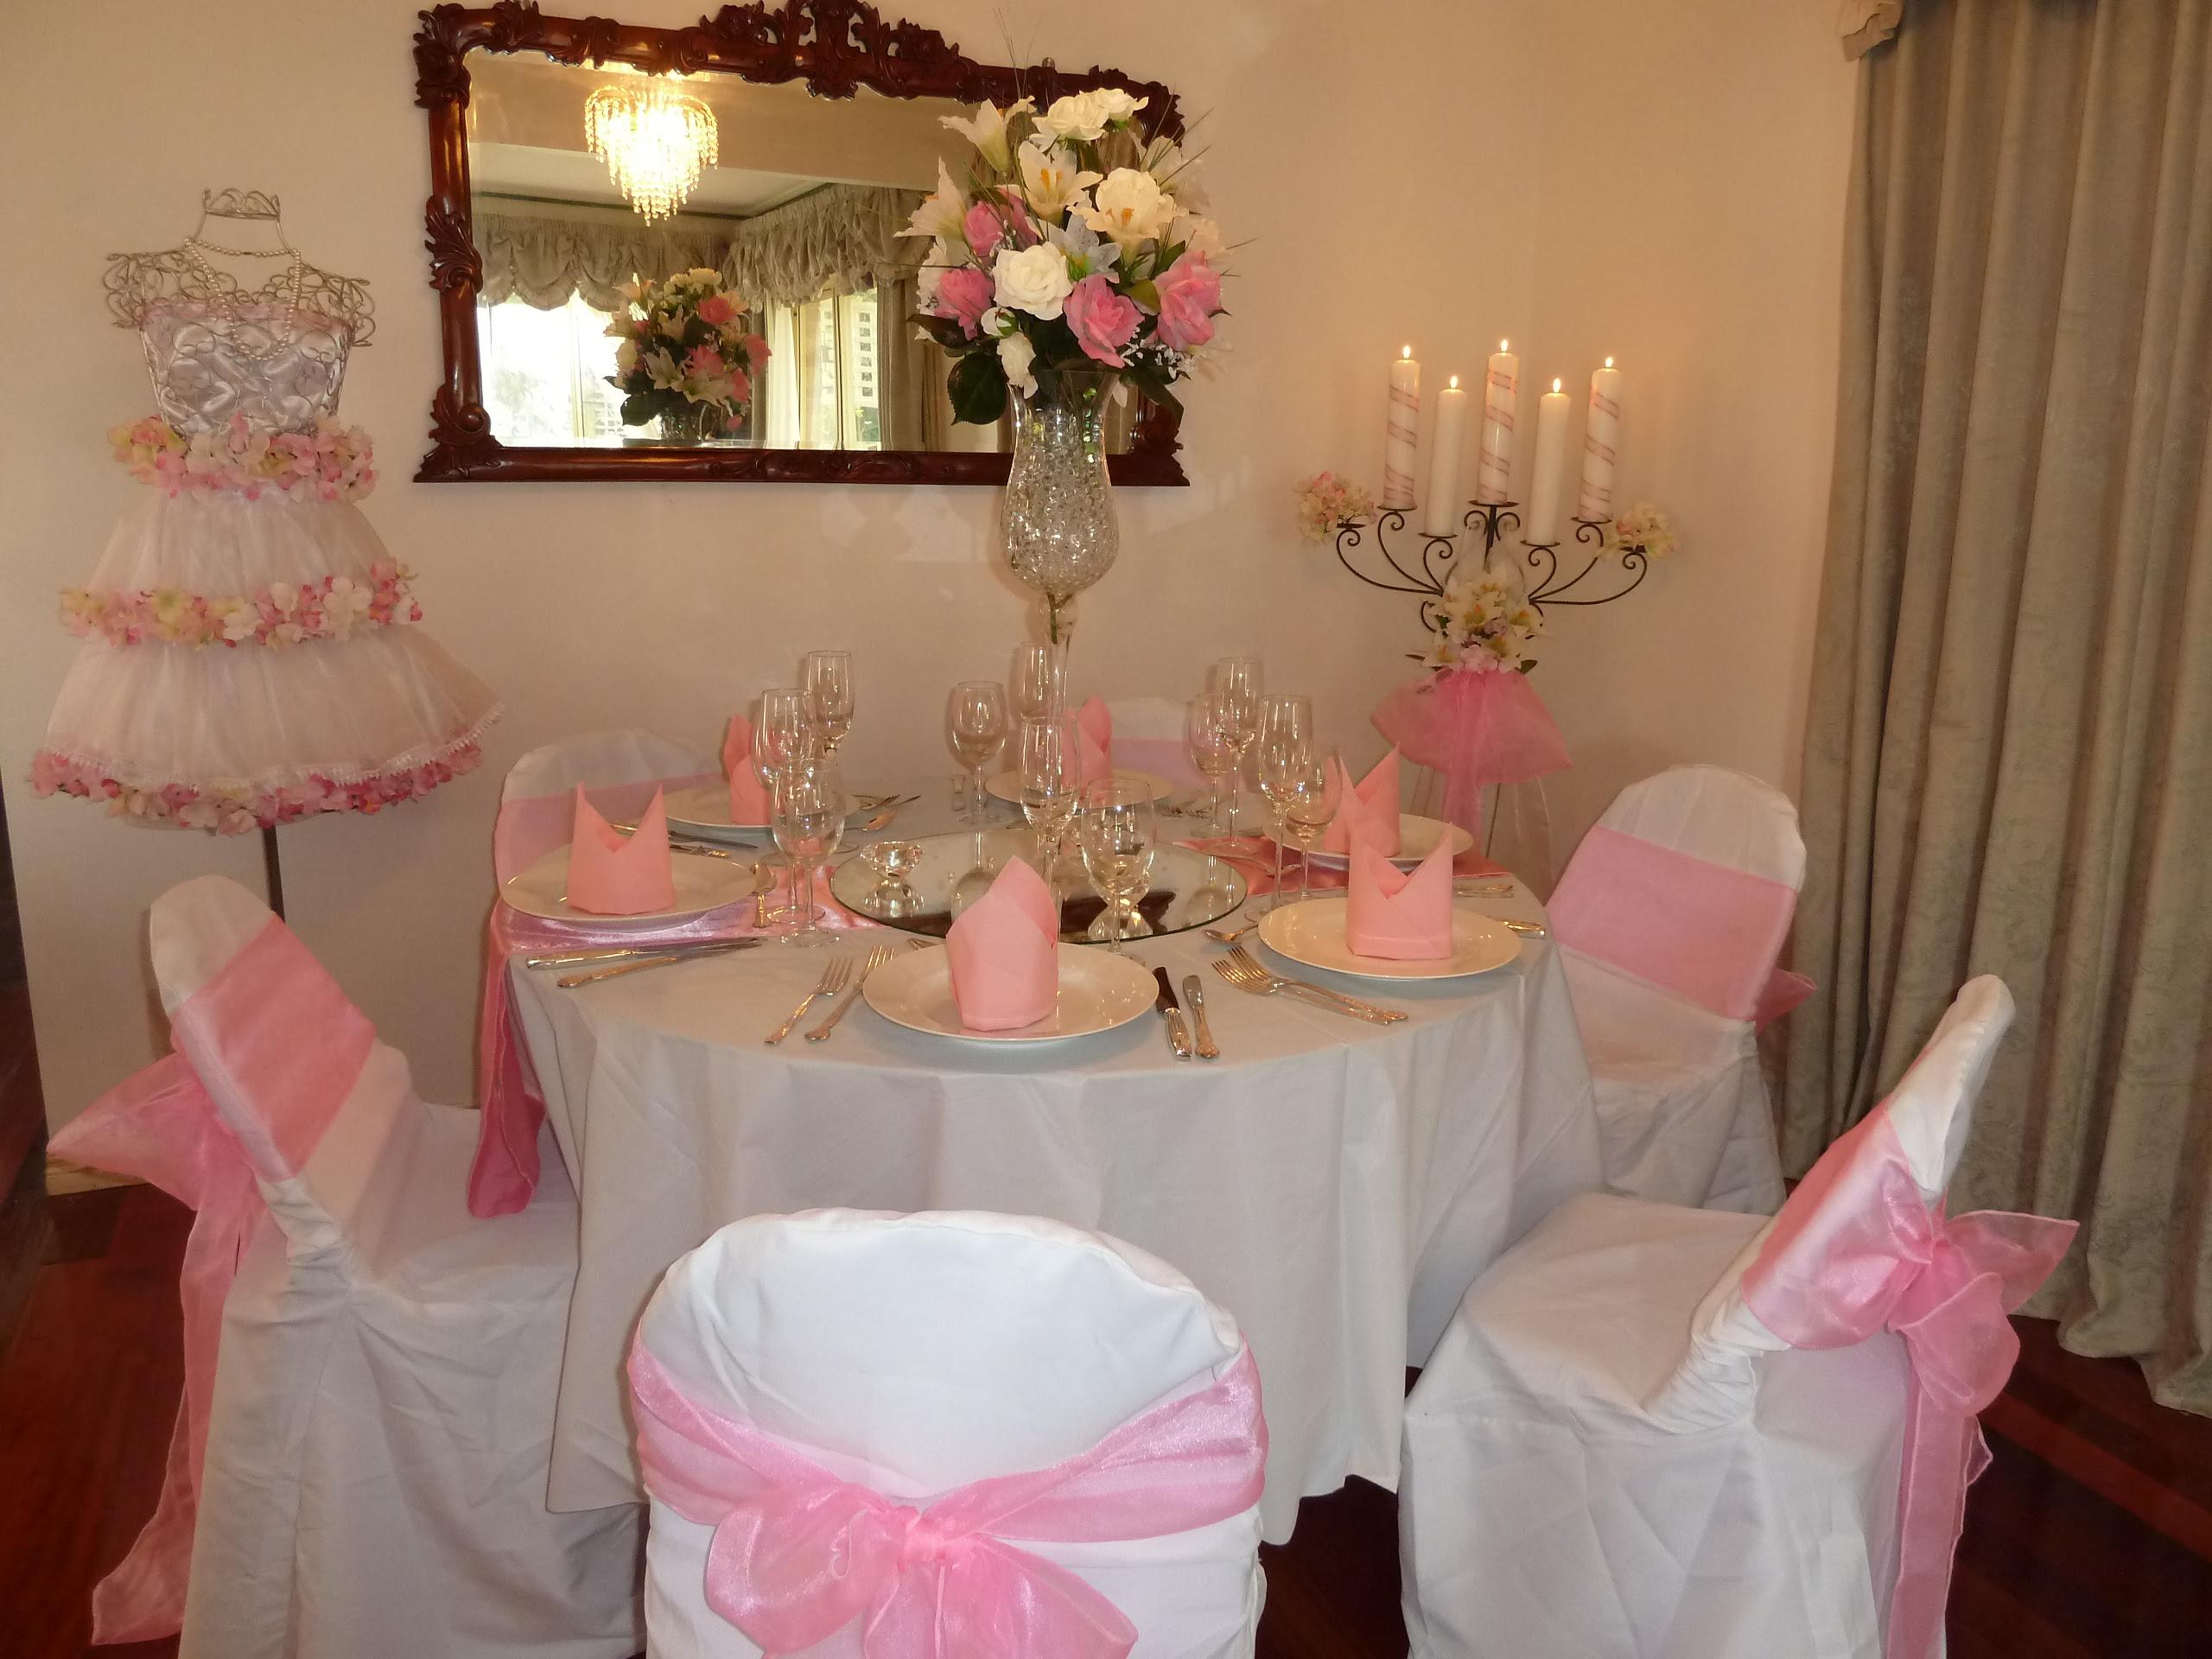 Christening Decorations Dining Room Design